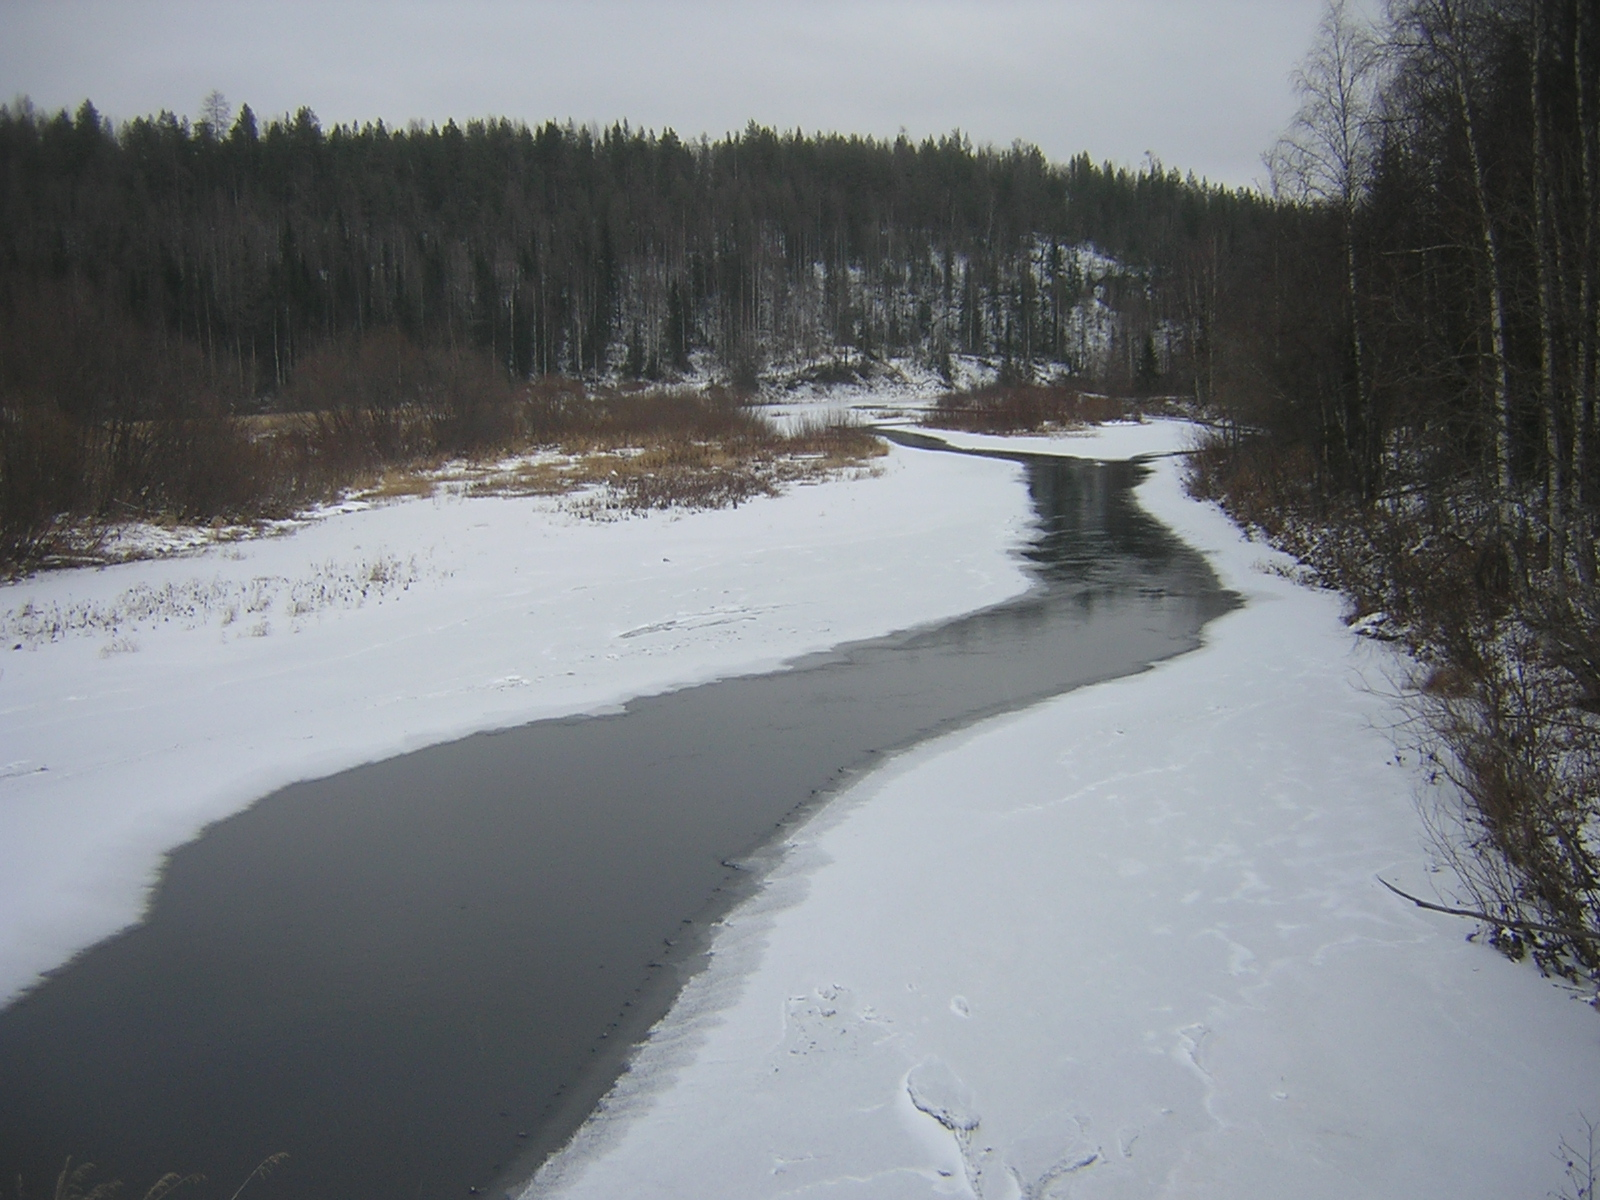 Chut Image File:chut' river.jpg